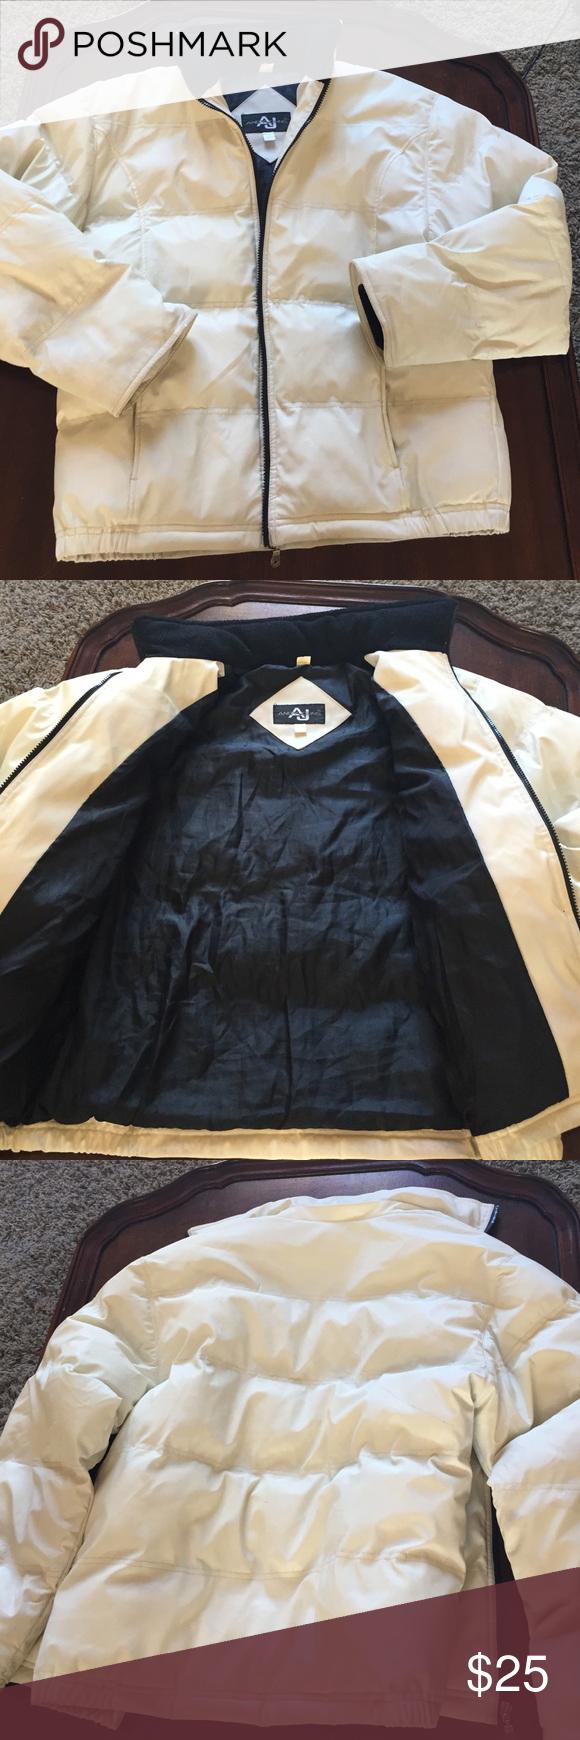 Andy John S Heavy White Puffer Jacket Puffer Jackets Jackets Puffer [ 1740 x 580 Pixel ]